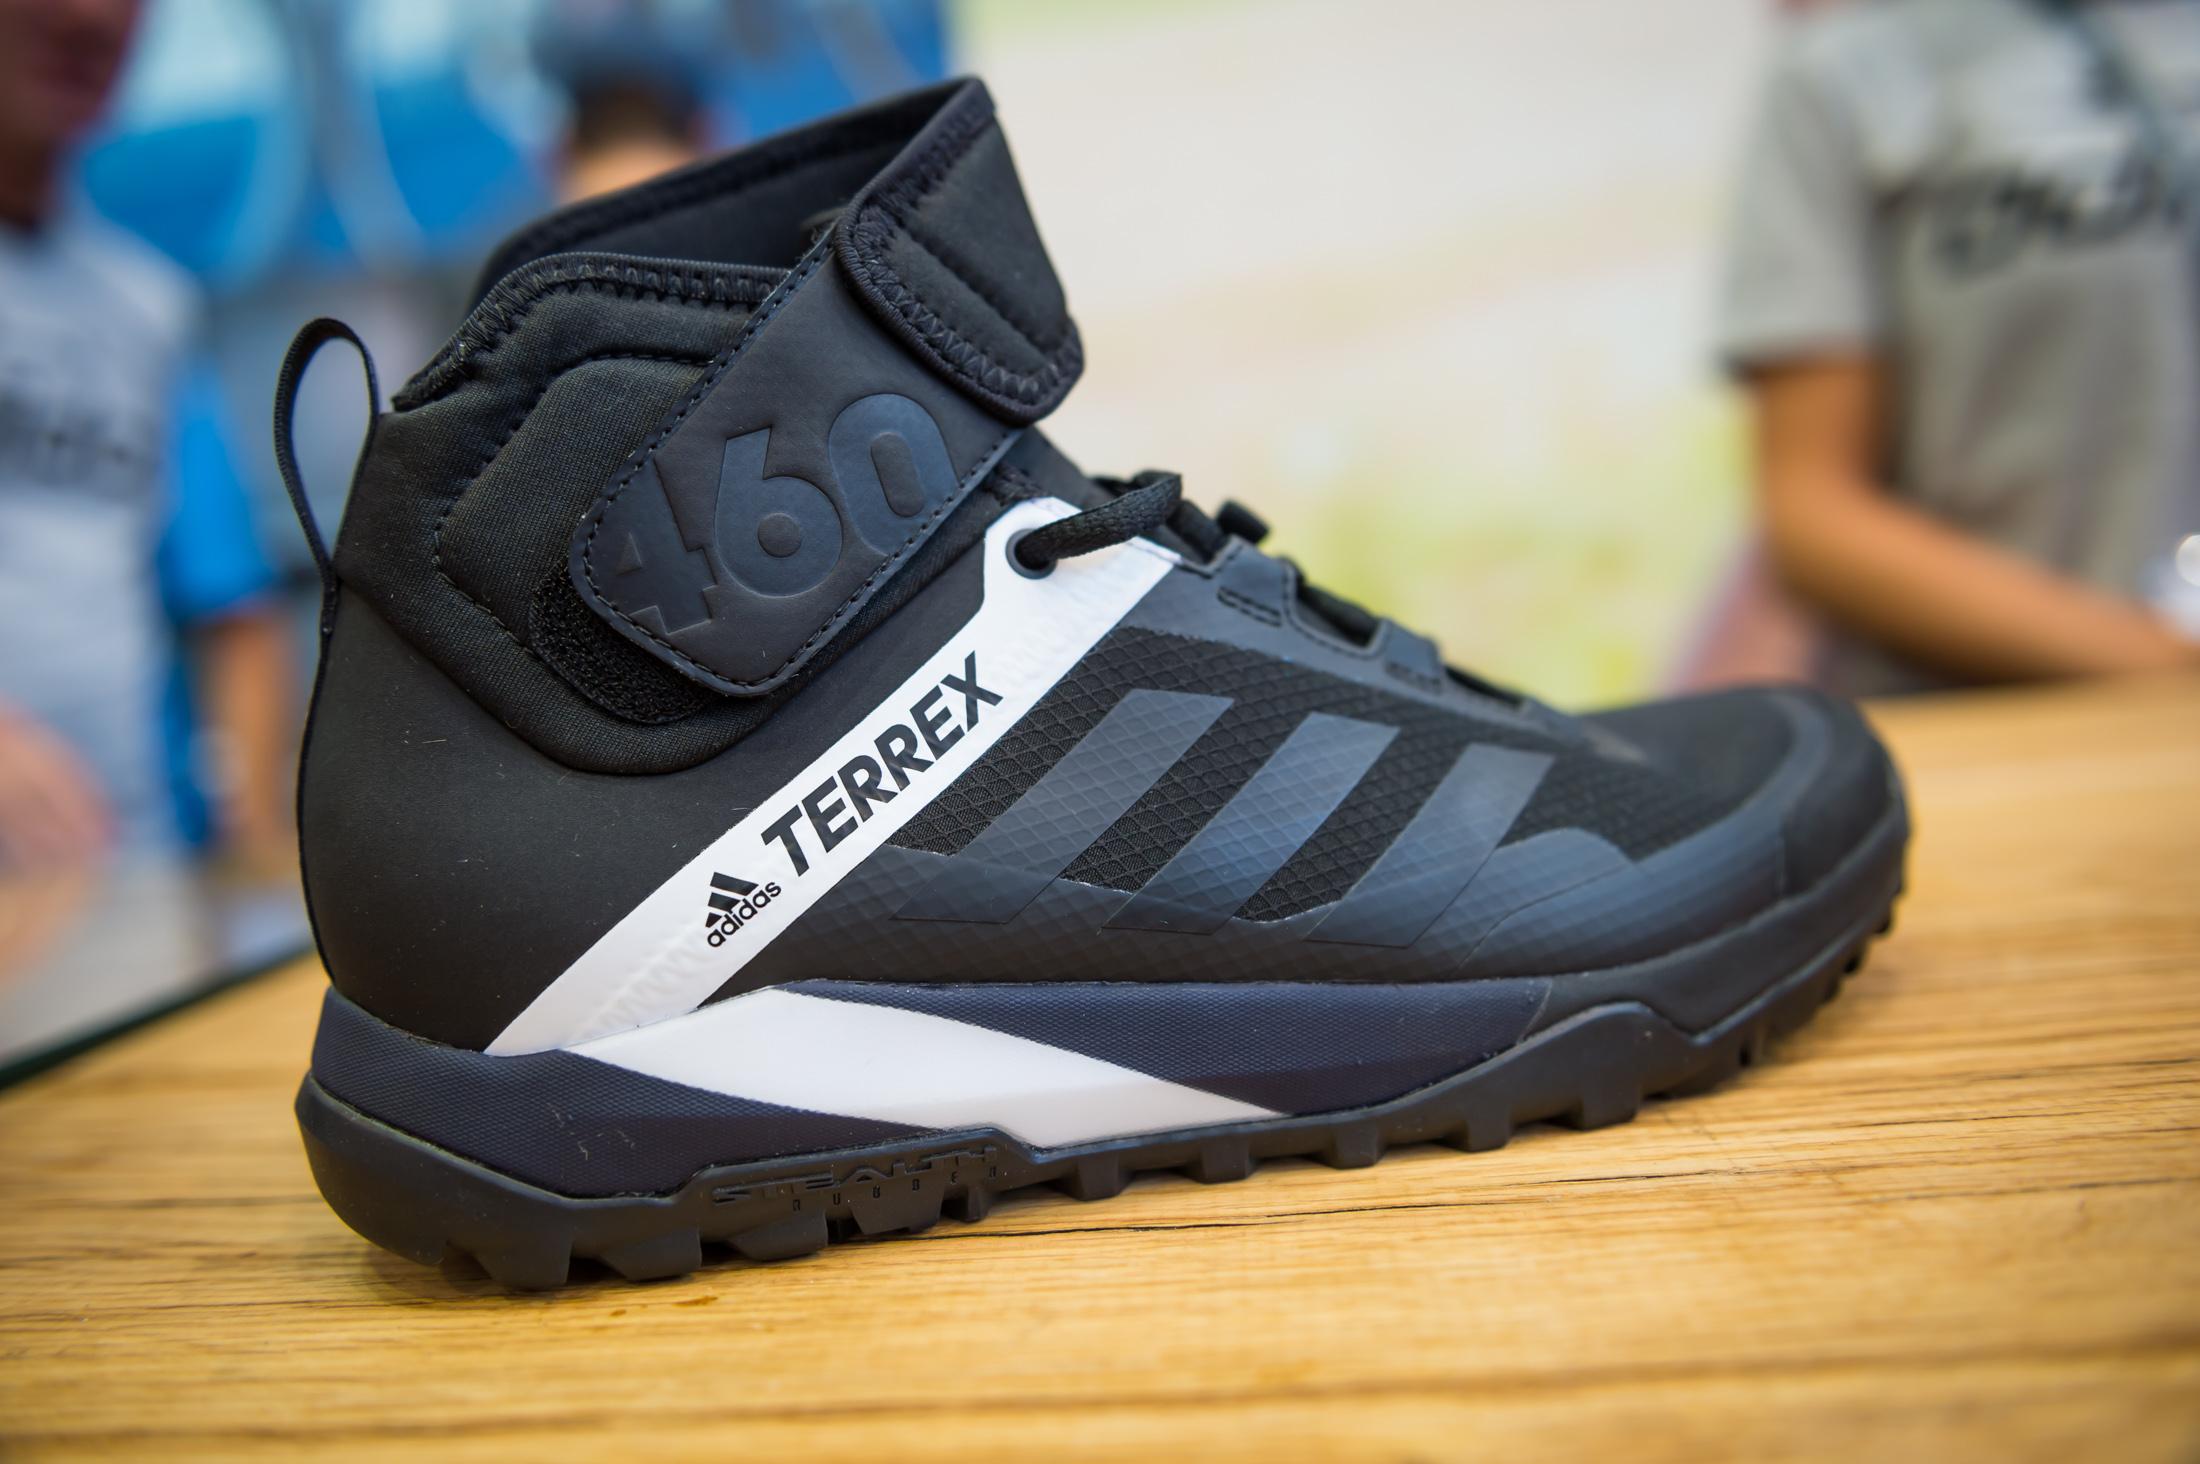 Adidas Terrex Trailcross Protect Shoe